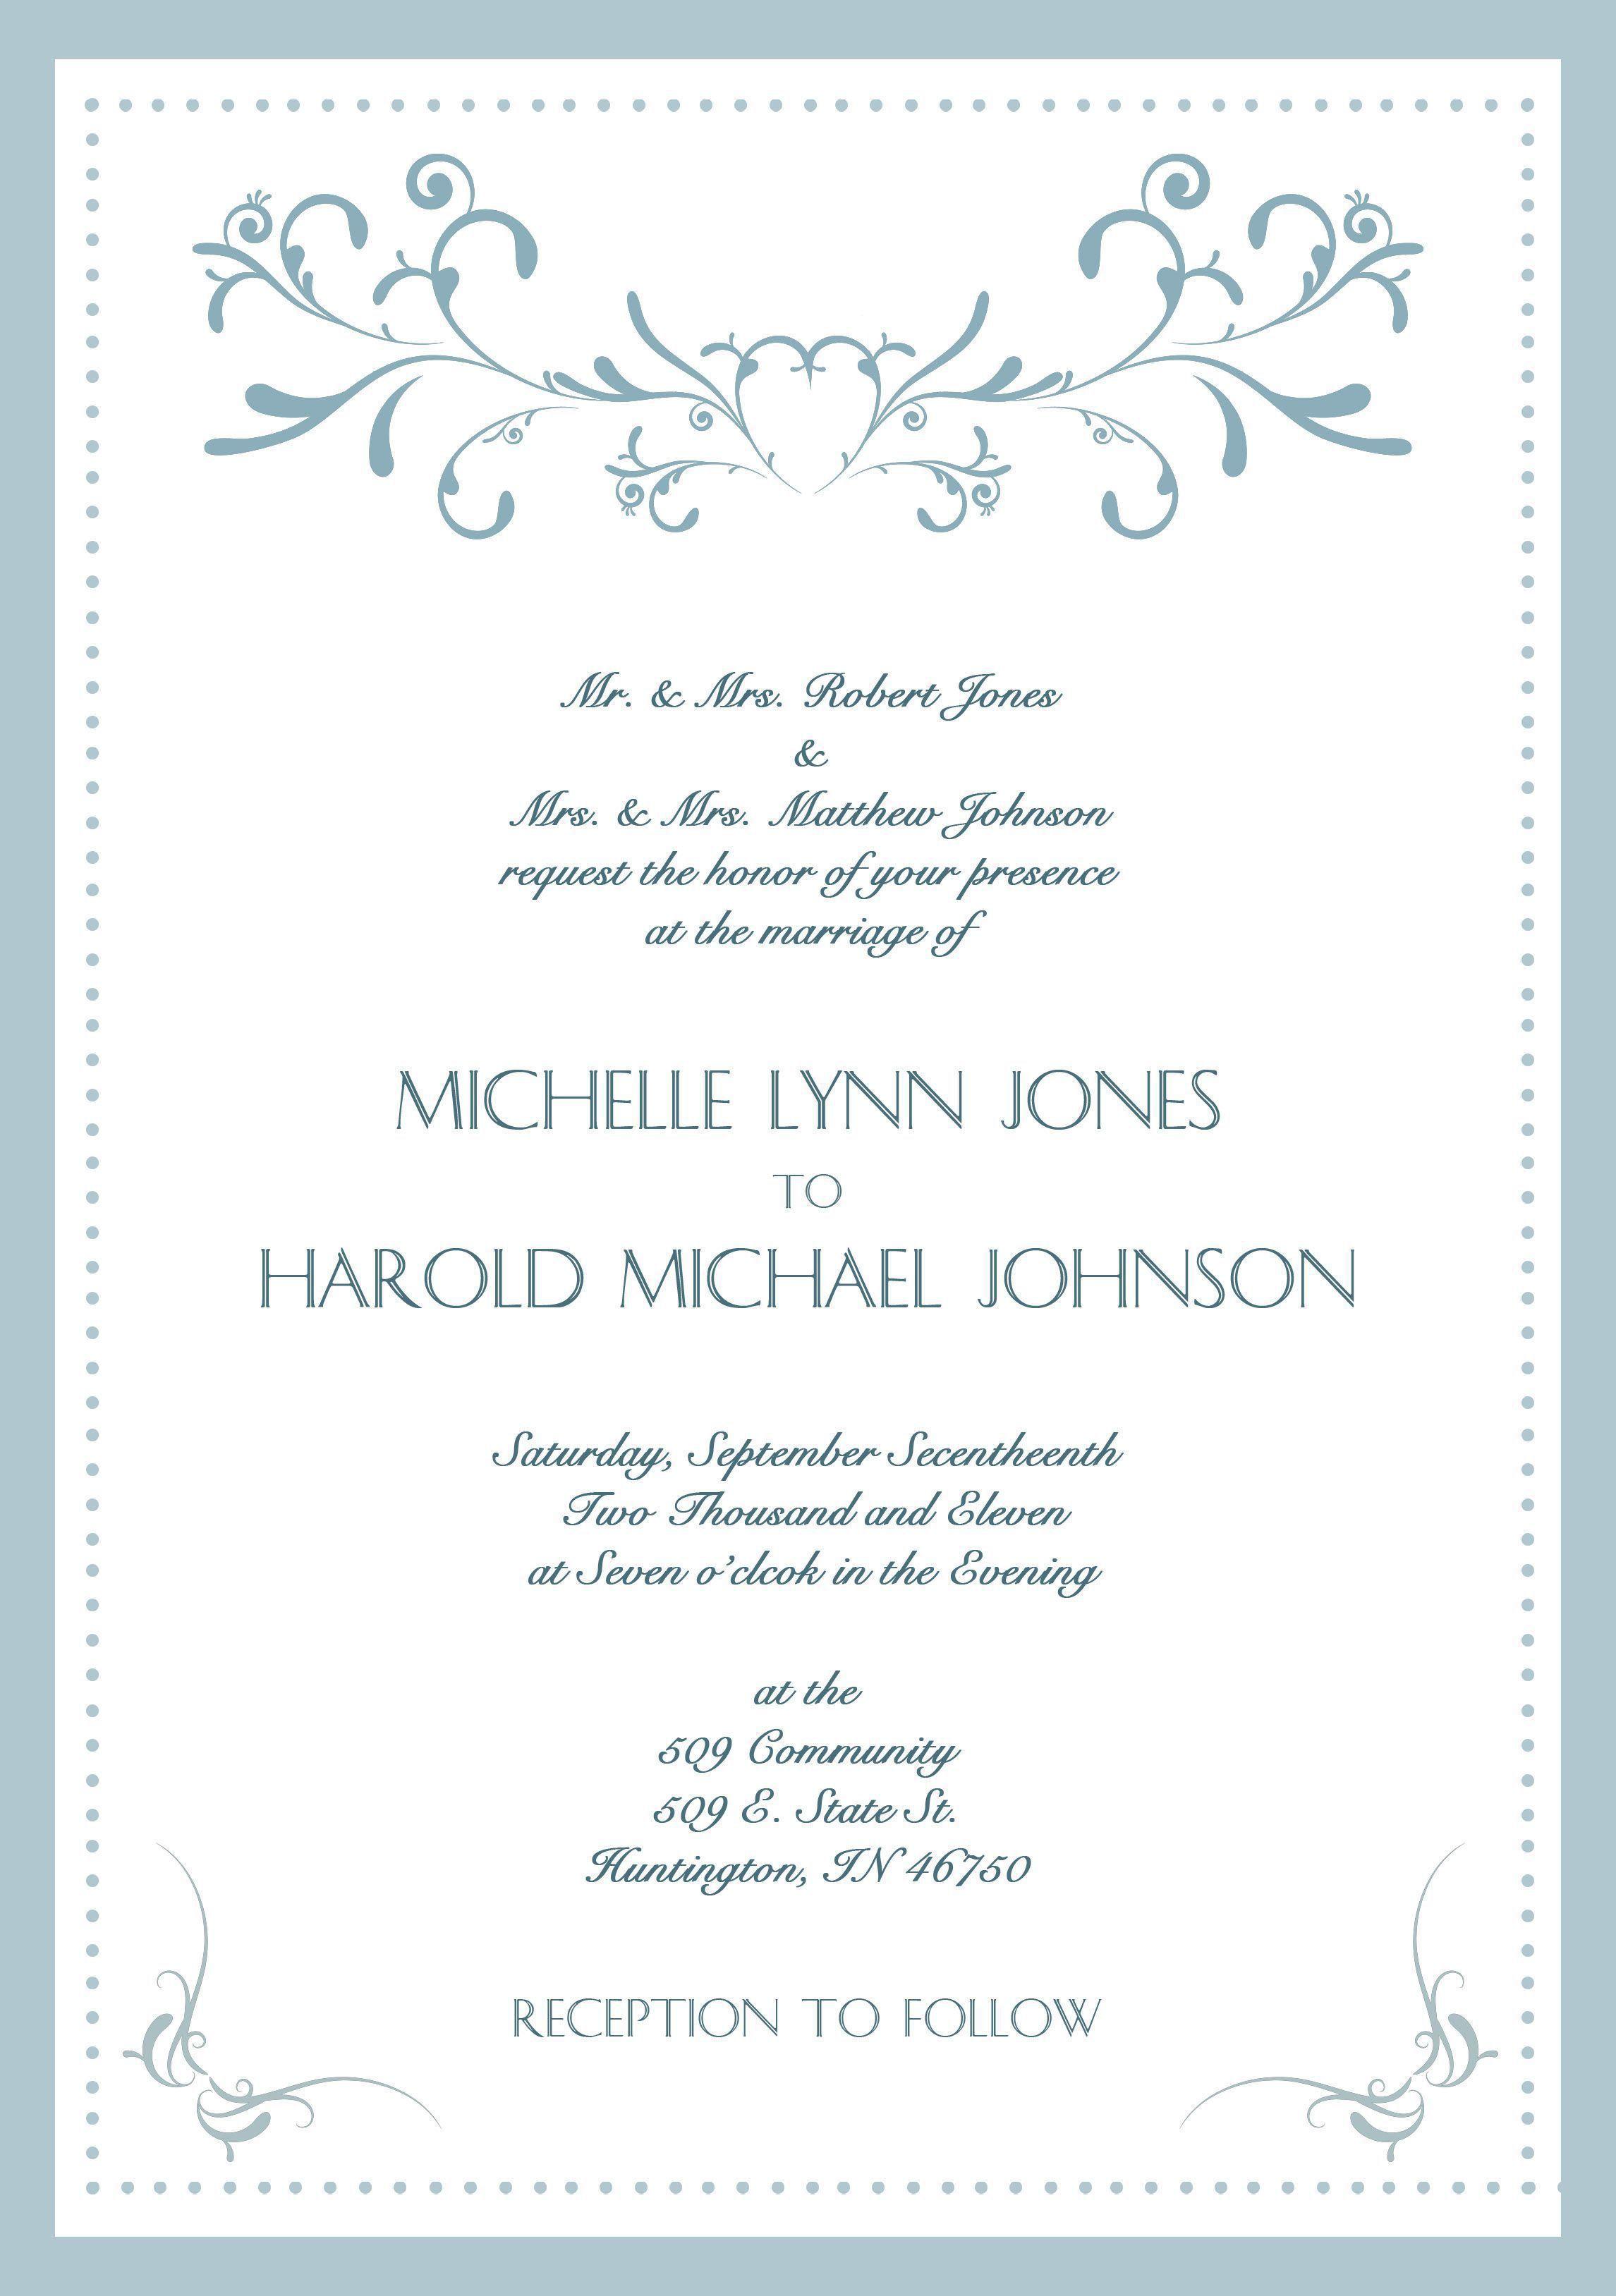 000 Dreaded Sample Wedding Invitation Card Template Photo  Templates Free Design Response WordingFull